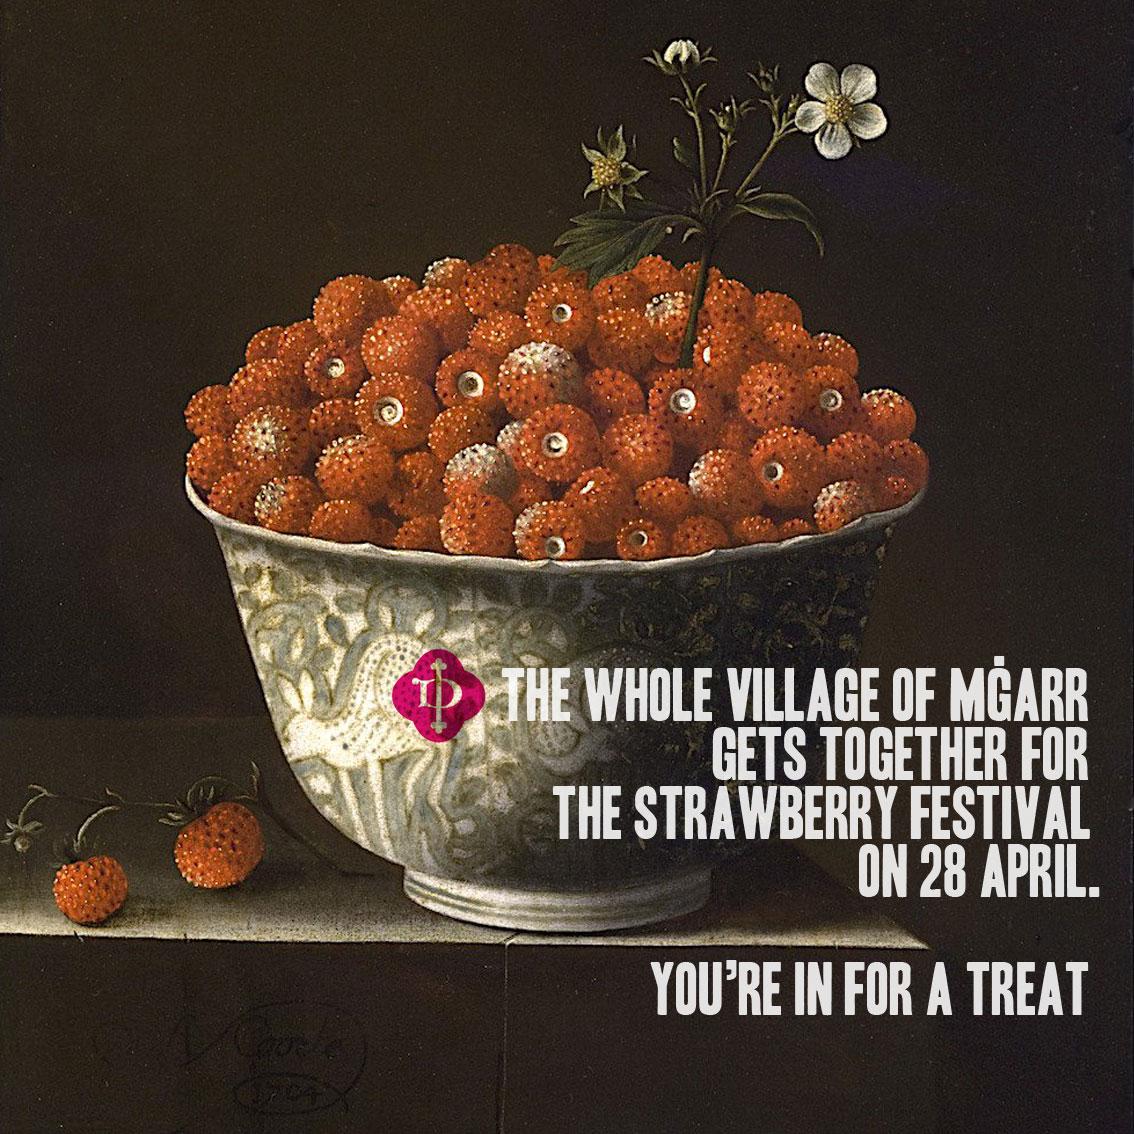 The Mġarr strawberry Festival